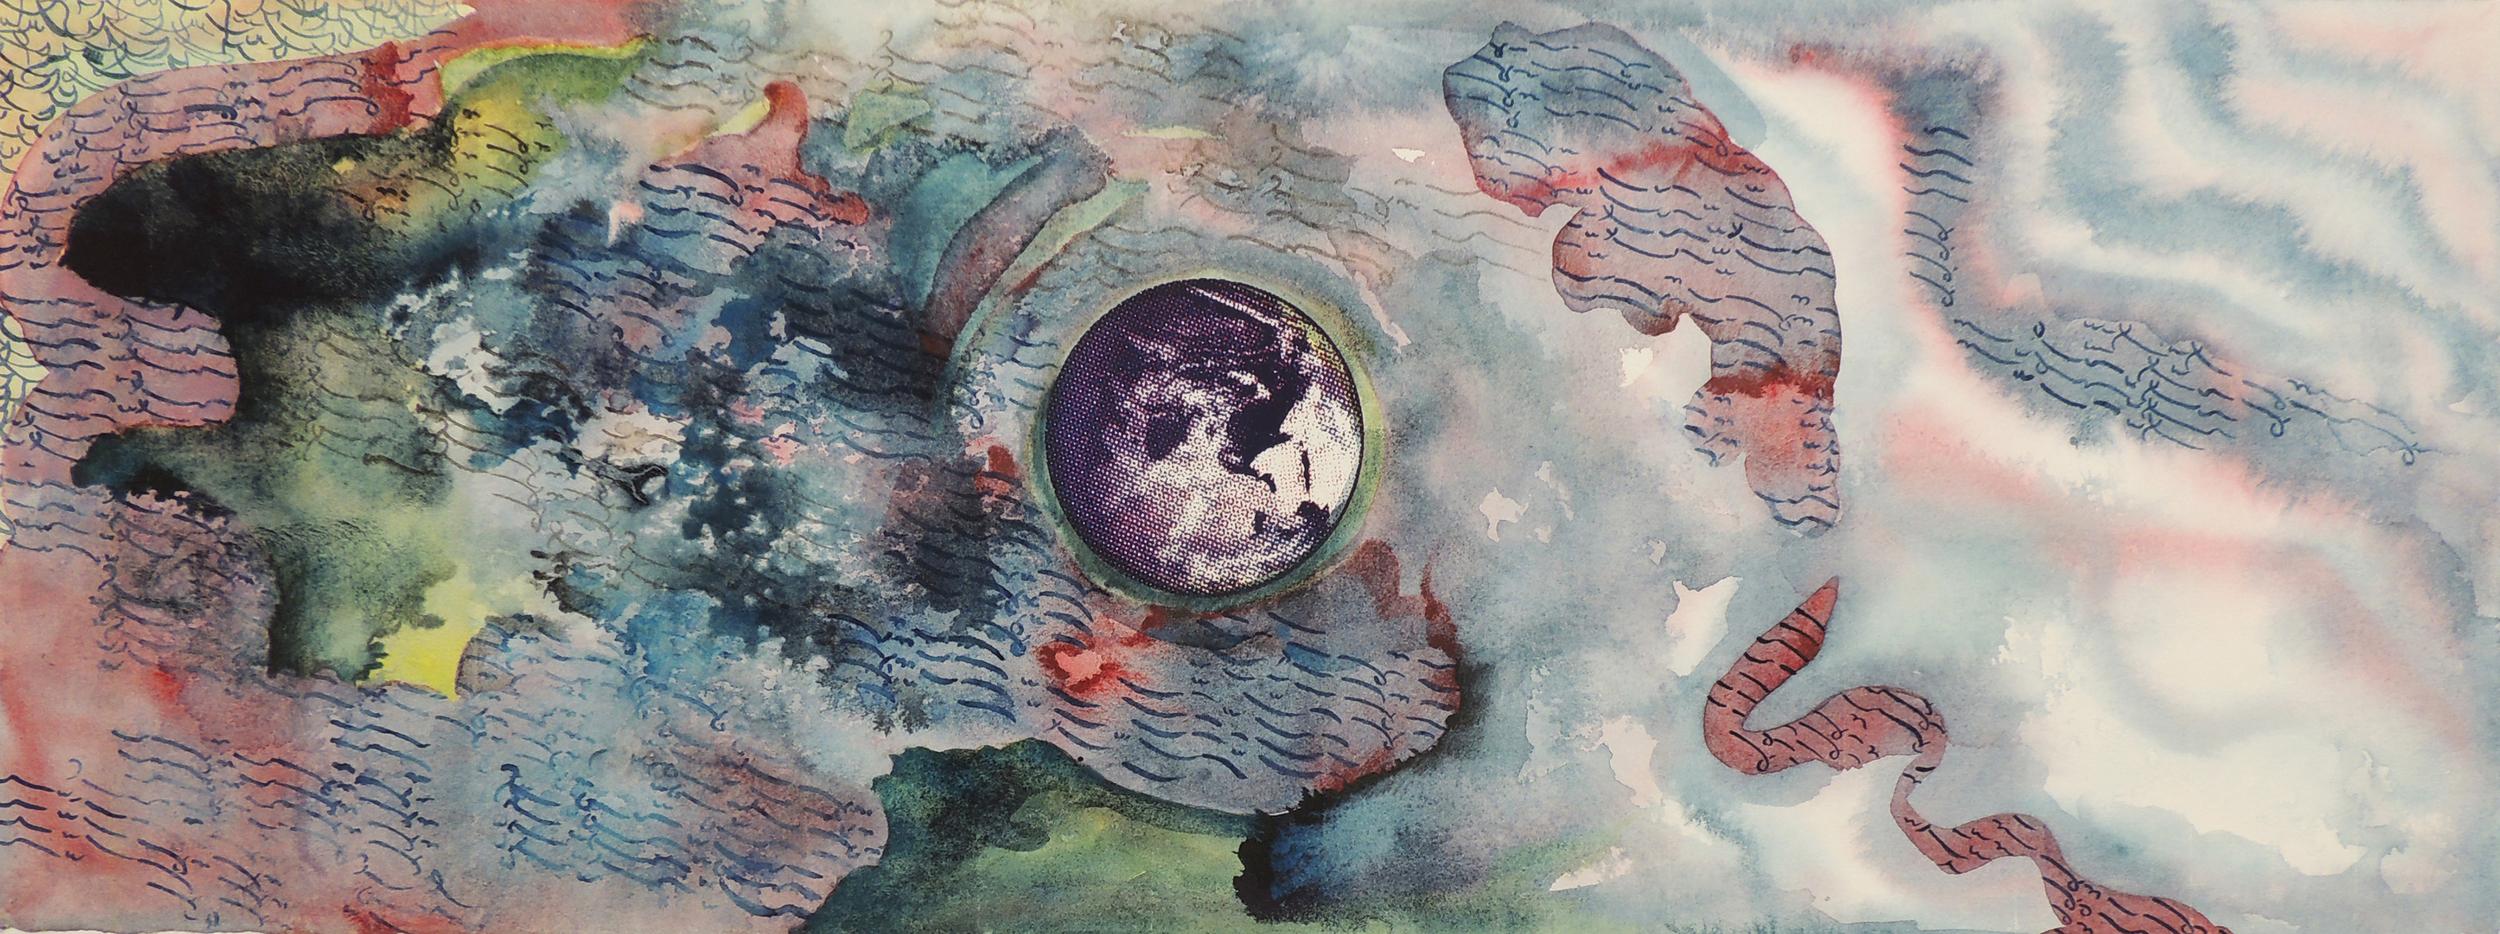 "Pantea Karimi, The Return of Geocentrism i,  2014,    watercolor and silkscreen on paper, 15""x 30""."